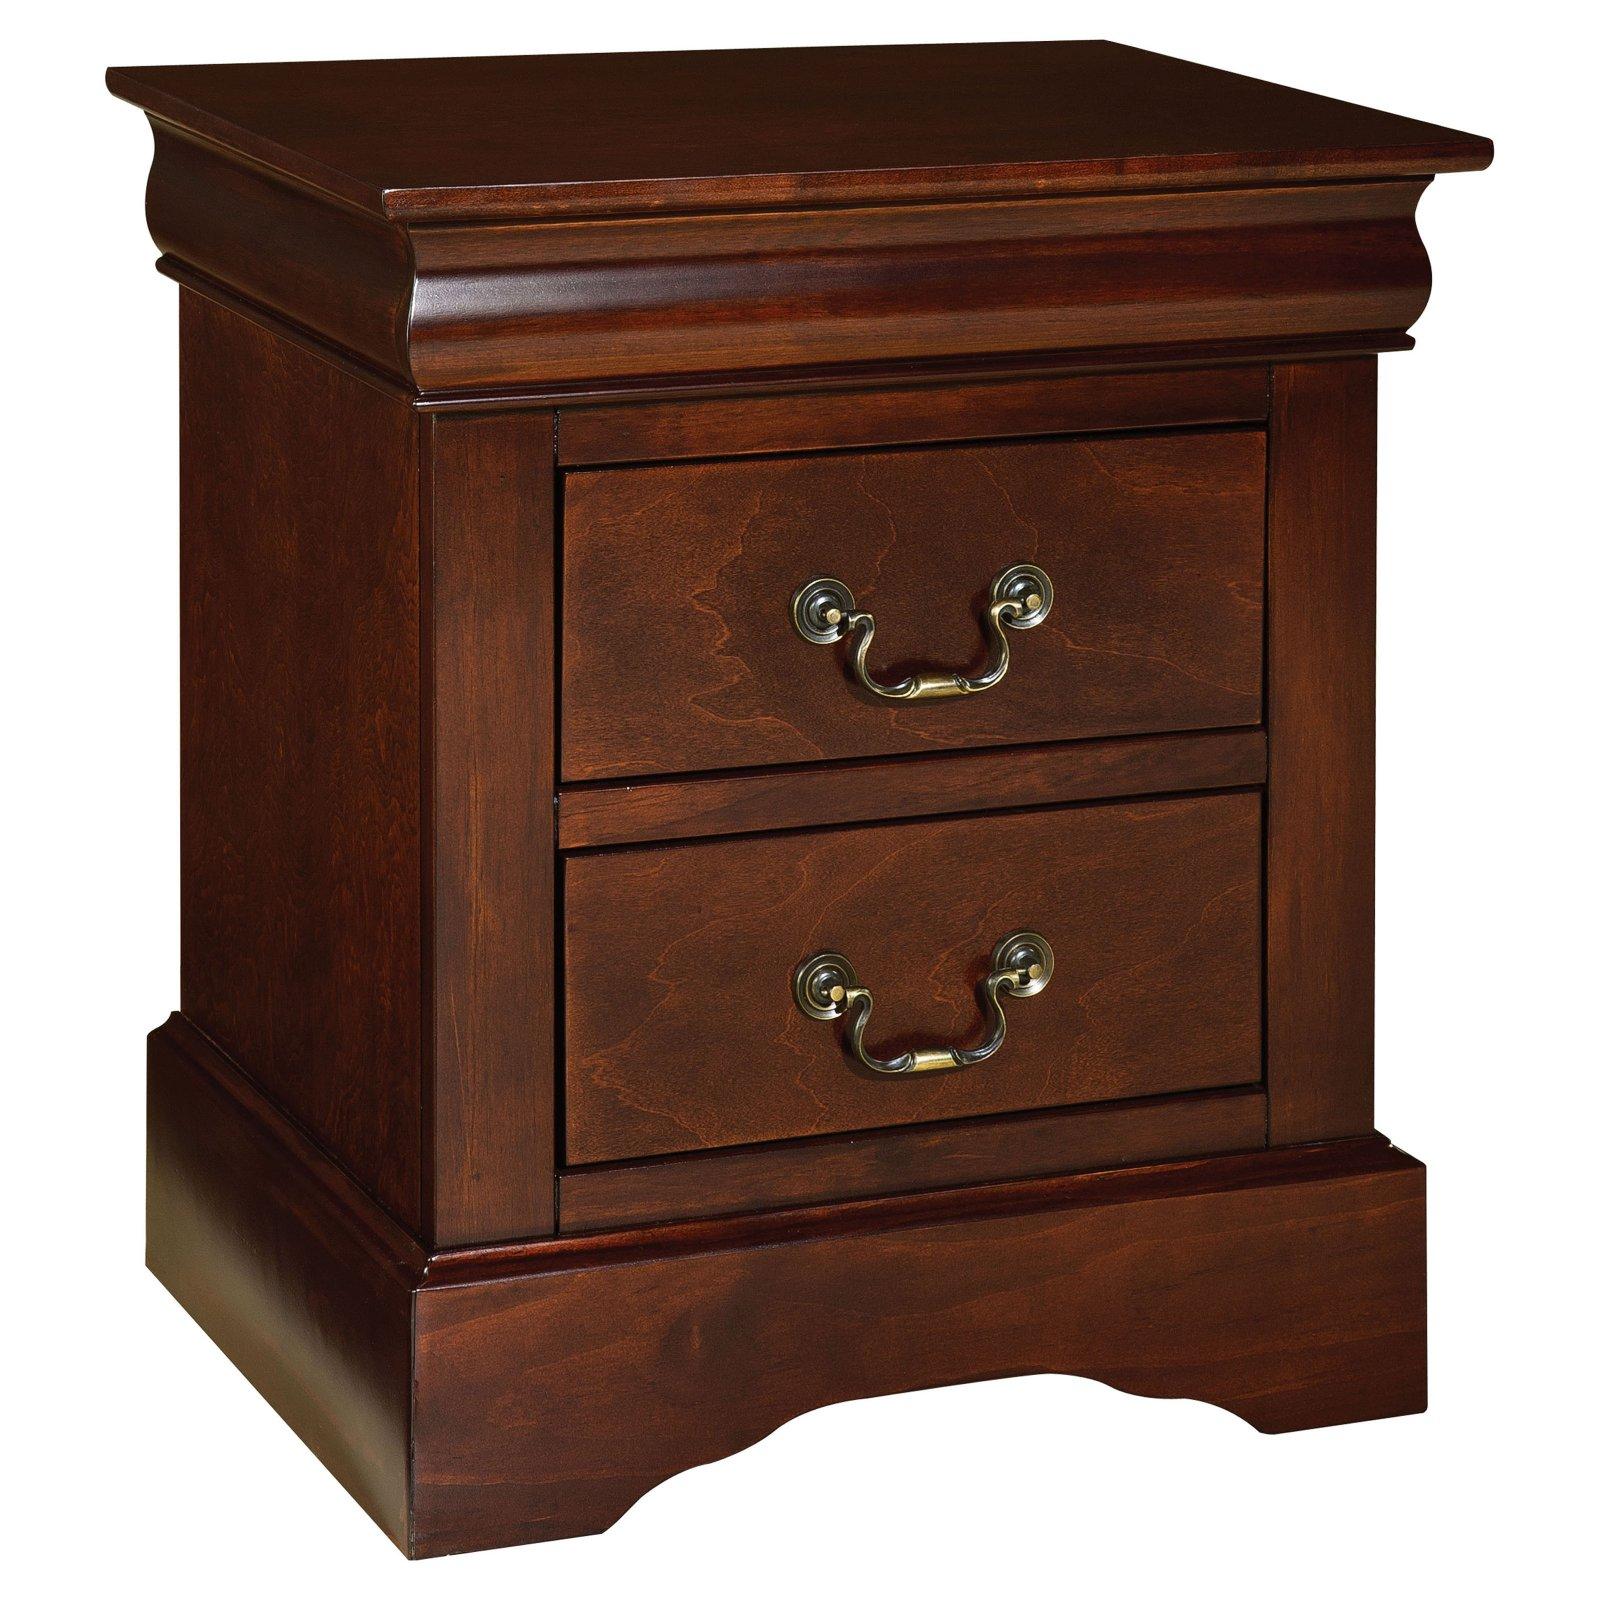 Standard Furniture Lewiston Nightstand